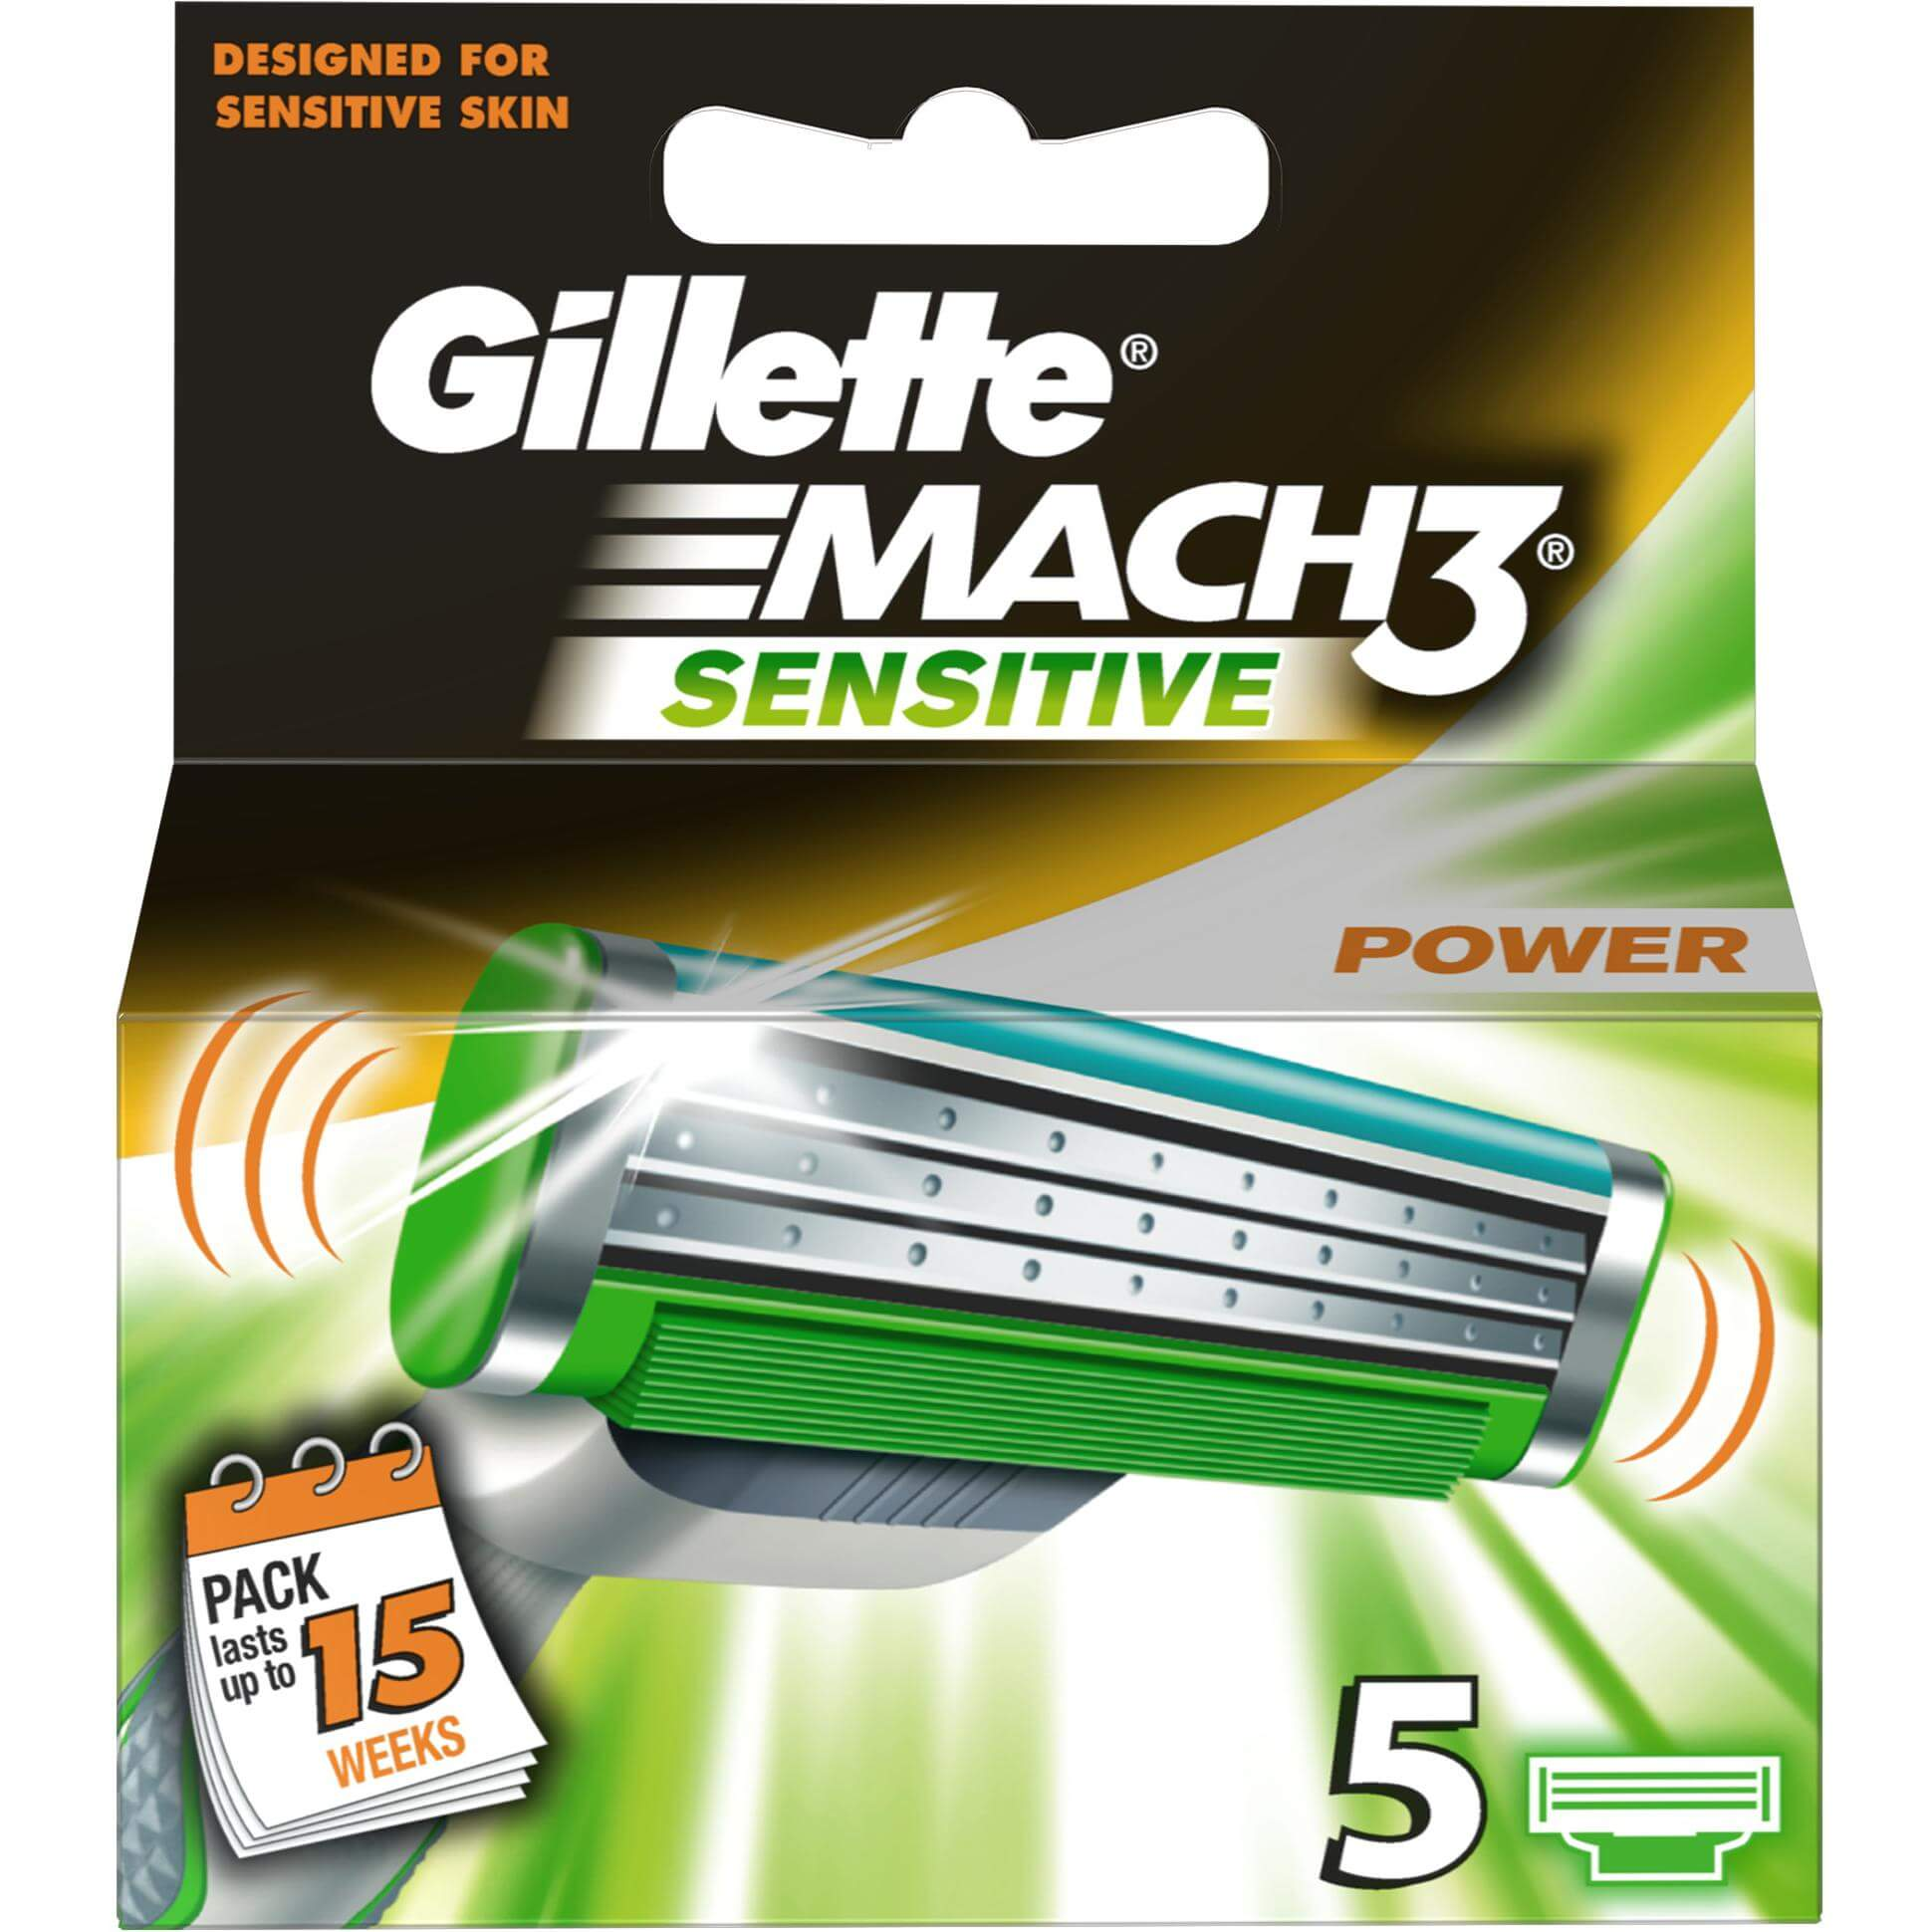 Gillette Mach 3 Power Sensitive Ανταλλακτικά Σχεδιασμένα για το Ευαίσθητο Δέρμα με Προηγμένη Κινούμενη Κεφαλή 5τμχ